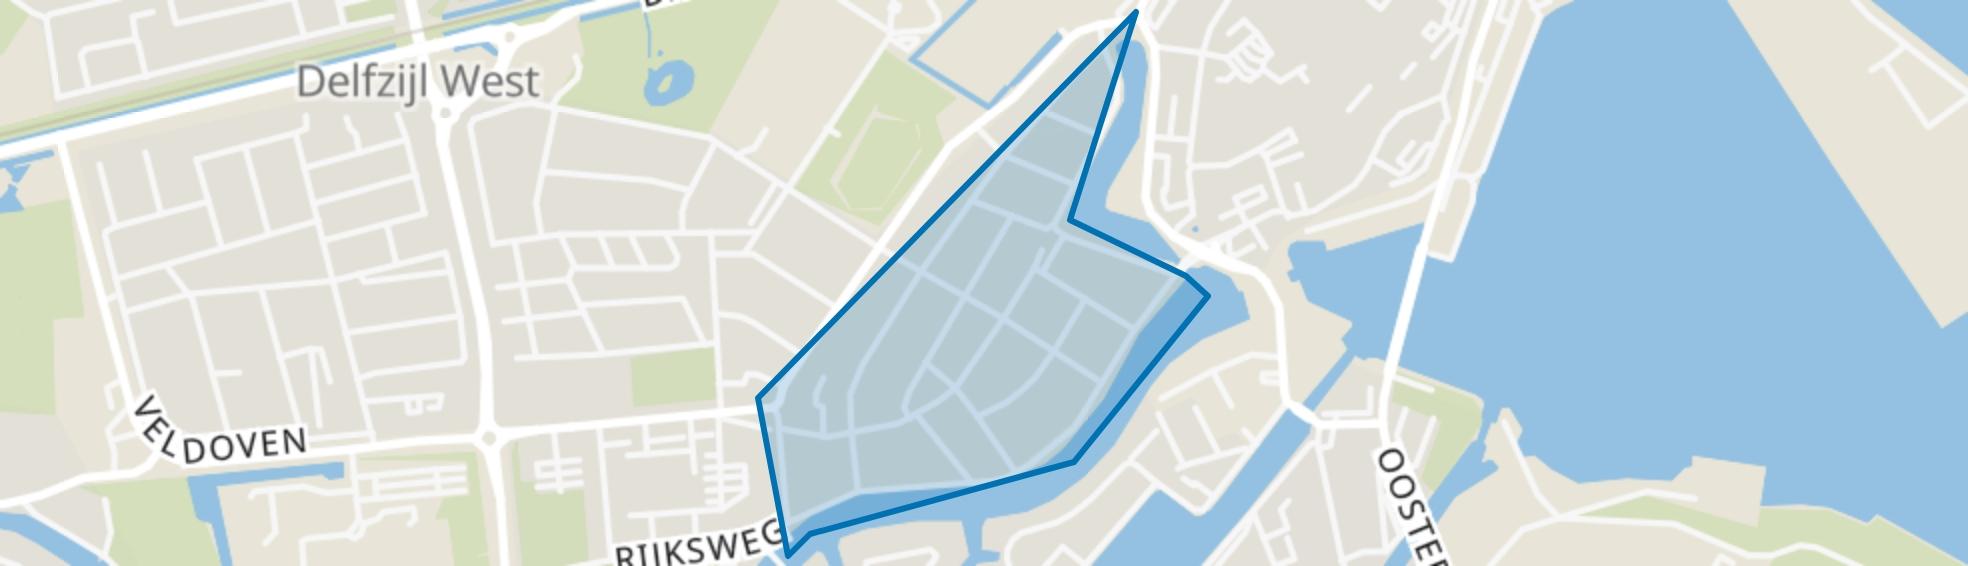 Over de Gracht, Delfzijl map